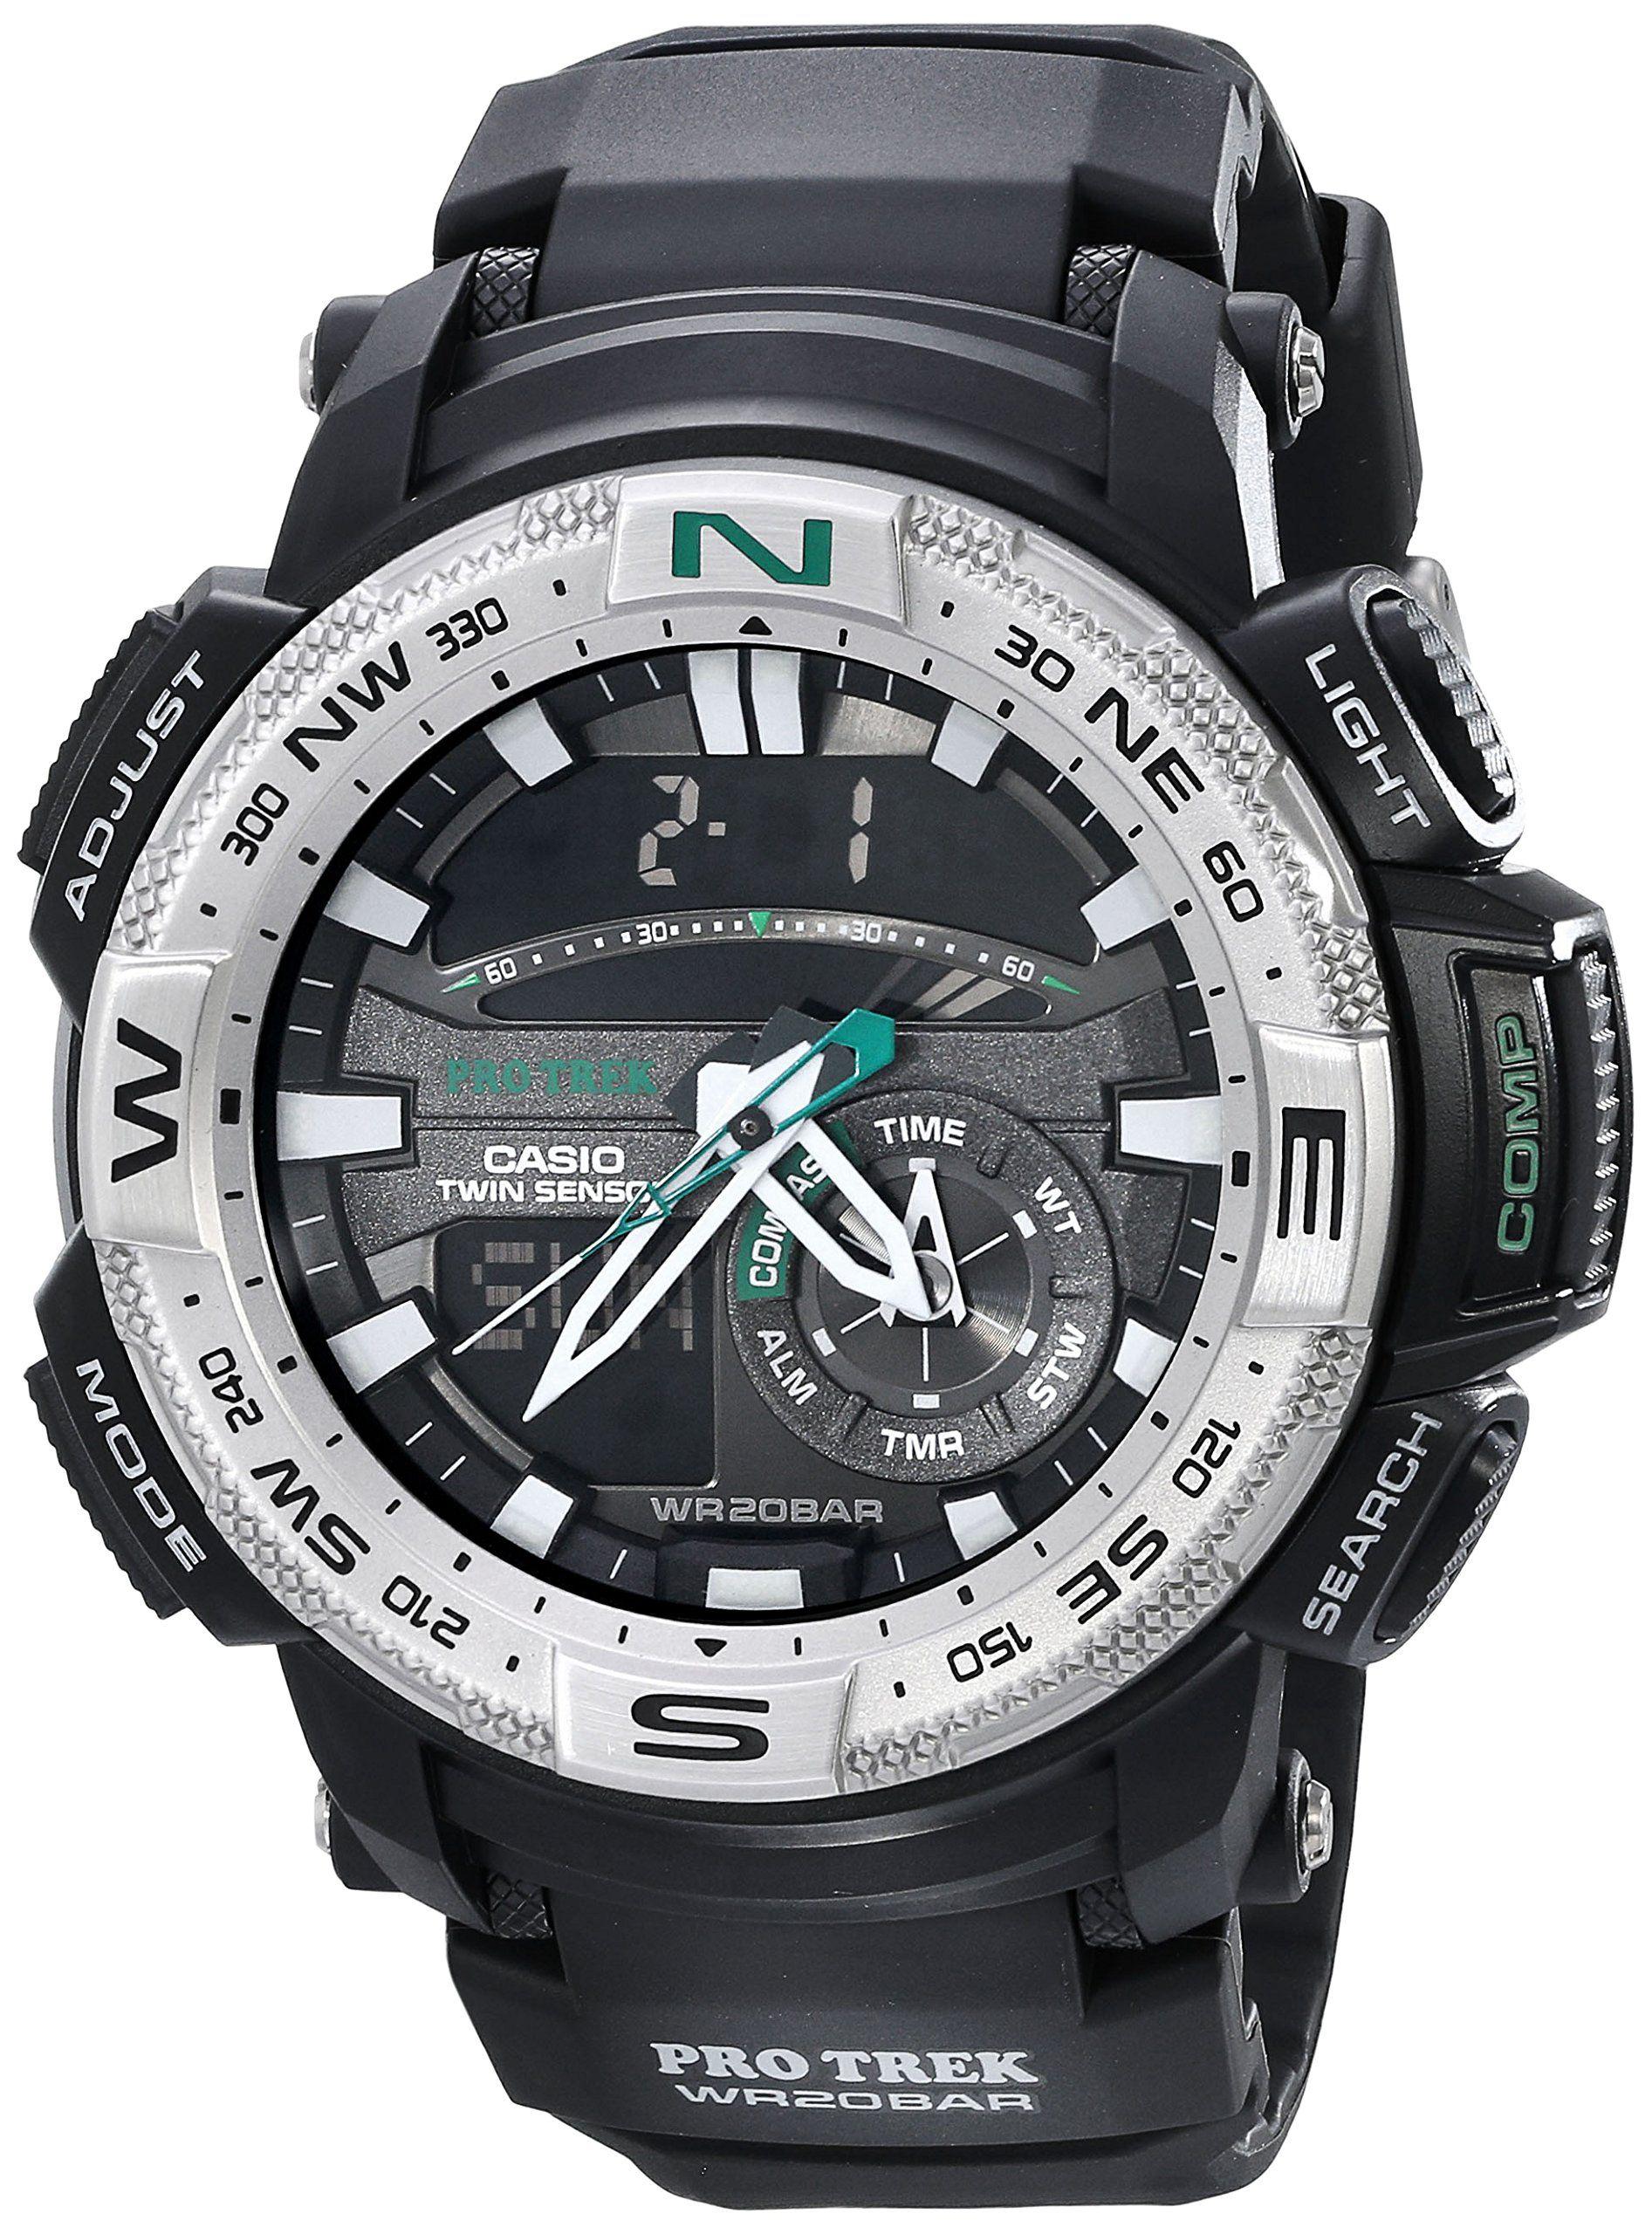 4c9fea281a41 Casio Men s PRG-280-1CR PRO TREK Analog-Digital Display Quartz Black Watch